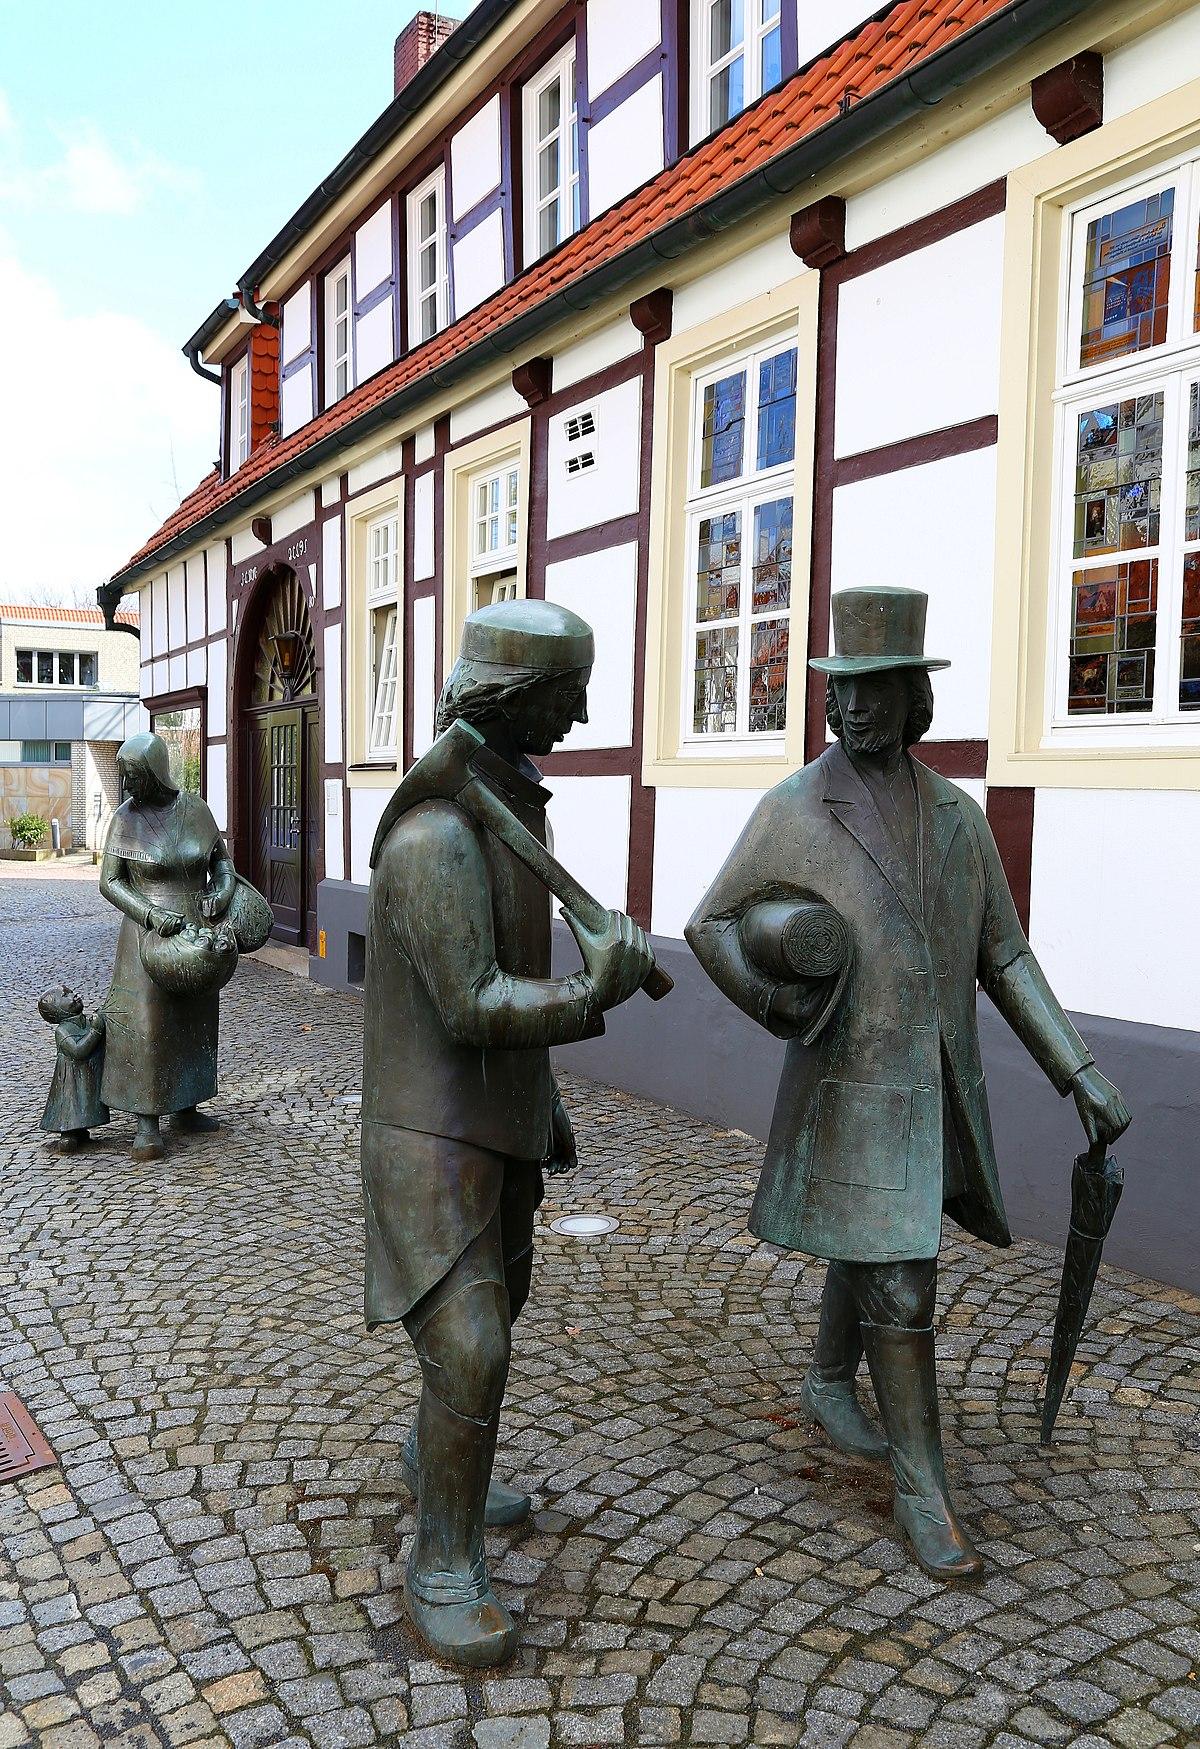 Daubenspeck Steinfurt